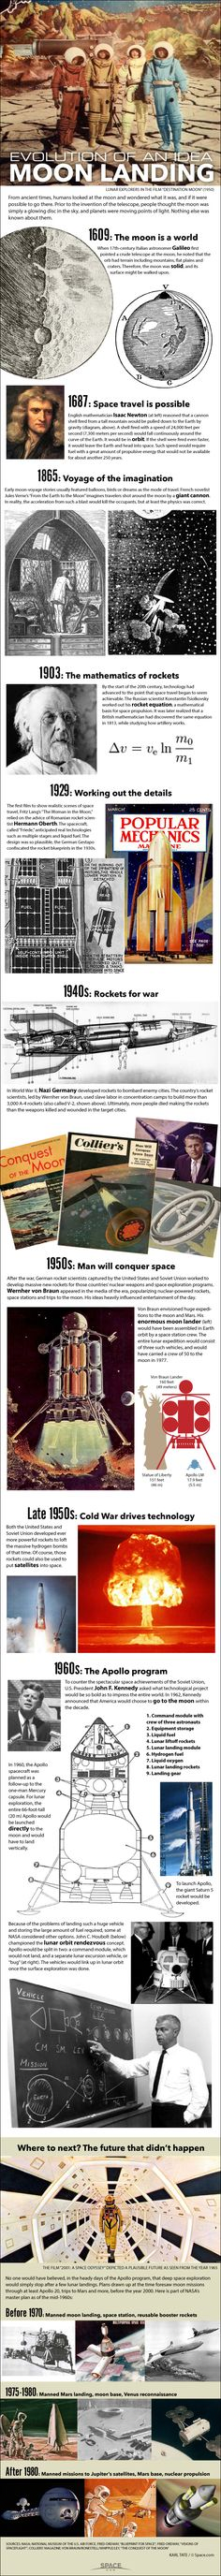 Evolution of a idea - moon landing